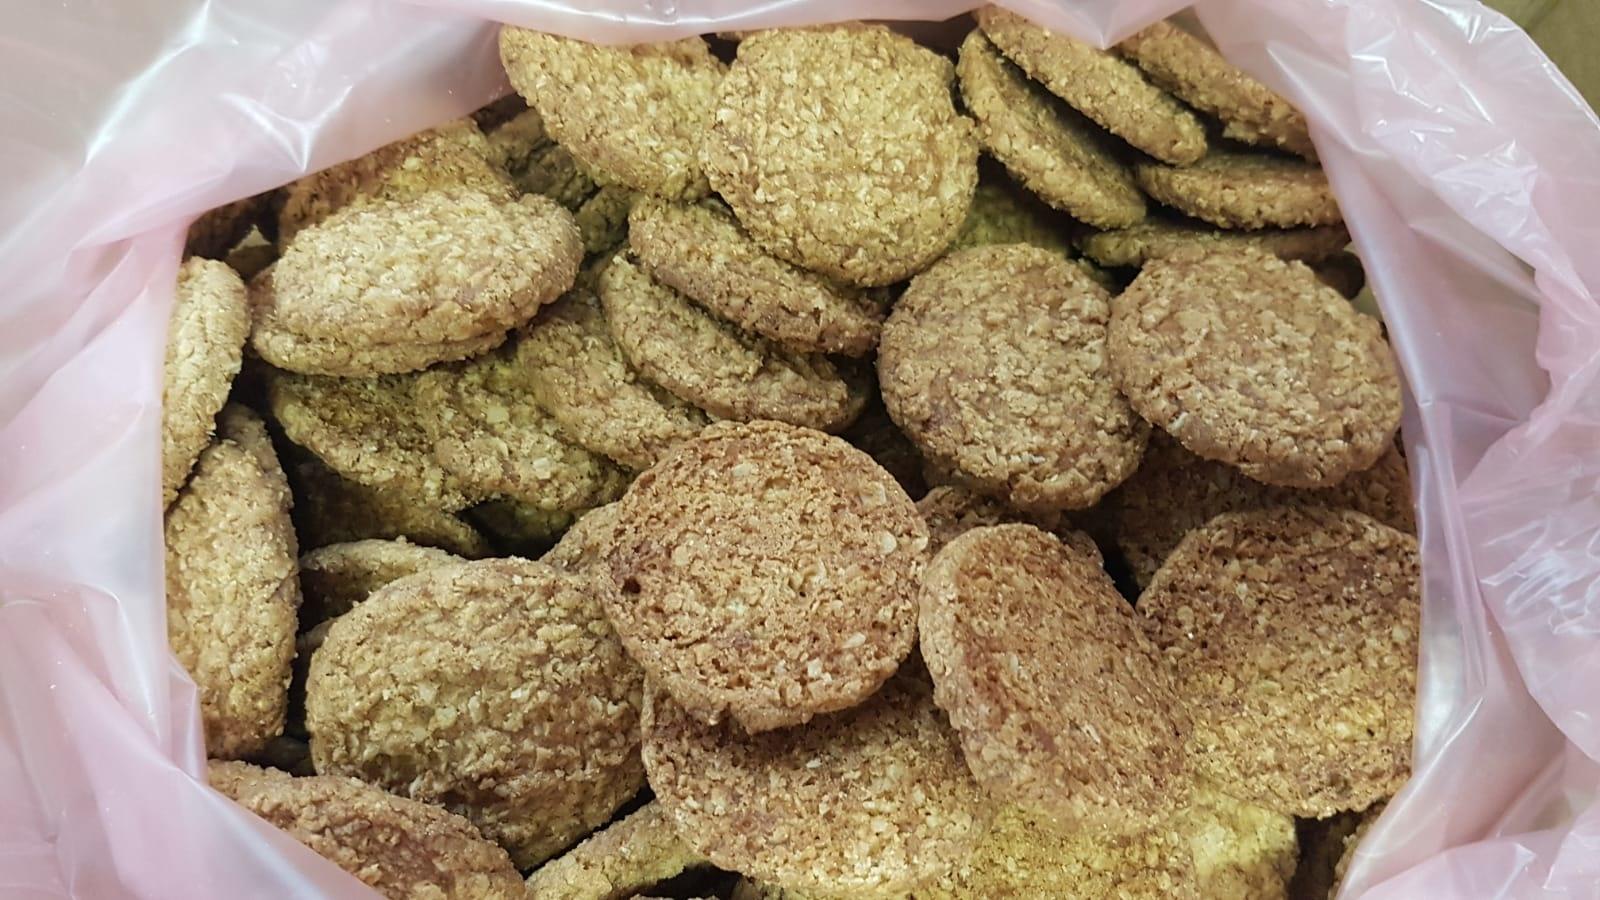 St Jacobs Country Bulk Crispy Oatmeal Supreme 5lb Box